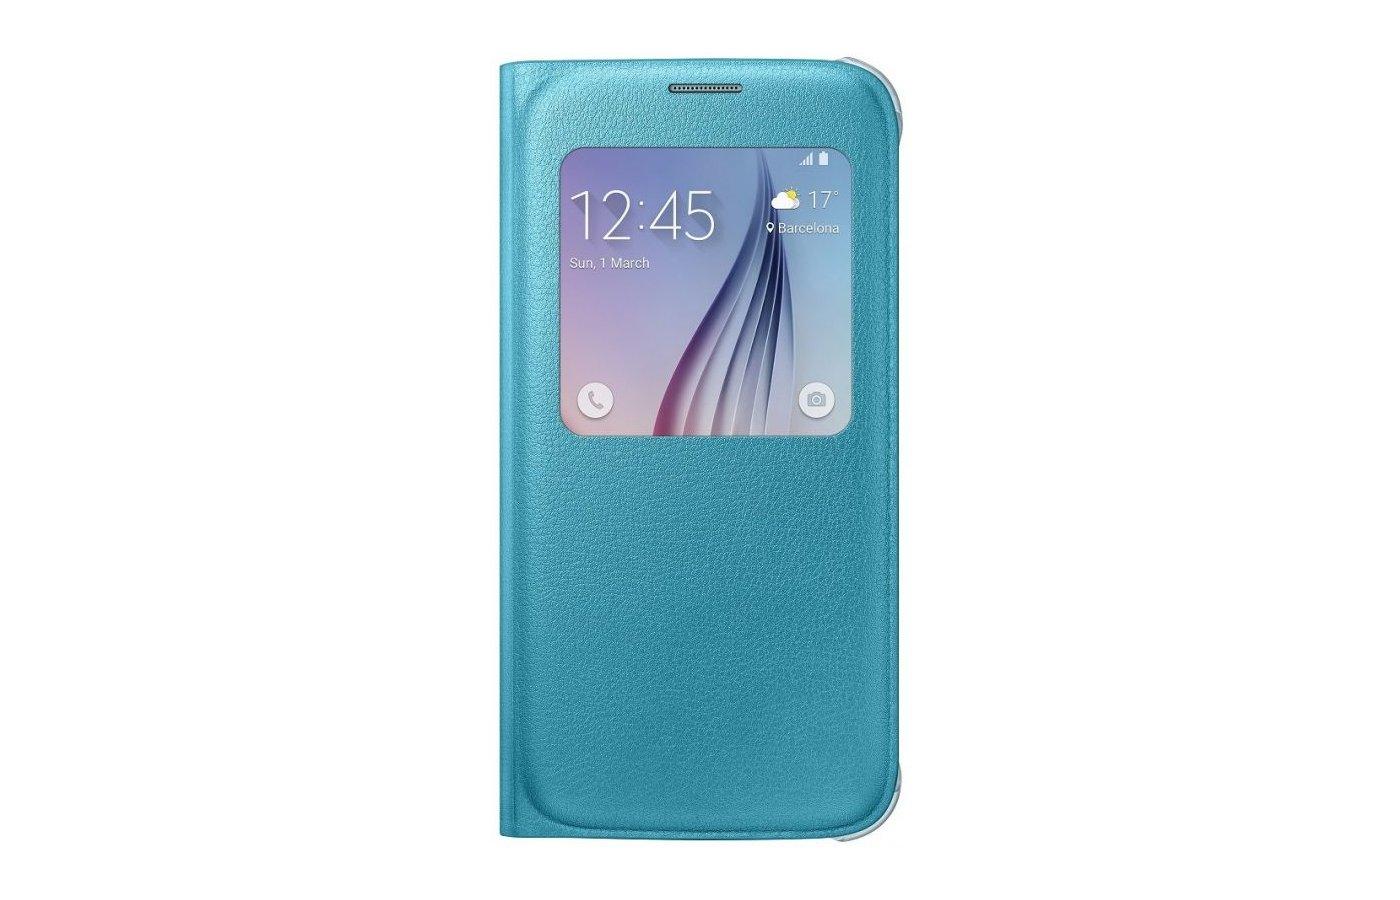 Чехол Samsung S-View для Galaxy S6 (SM-G920) (EF-CG920PLEGRU) голубой